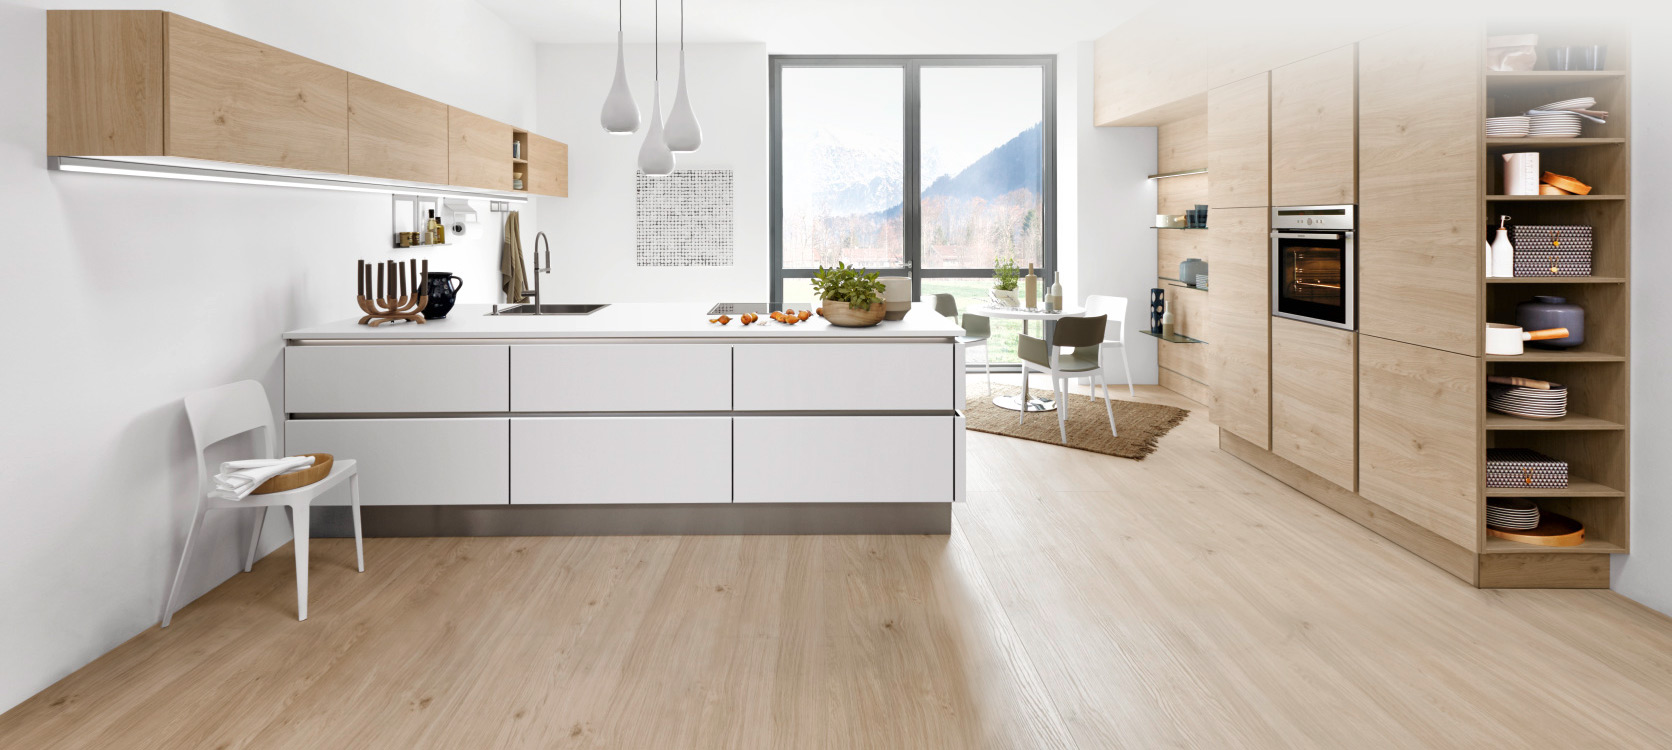 katalog mebli nolte nolte katowice krak w. Black Bedroom Furniture Sets. Home Design Ideas